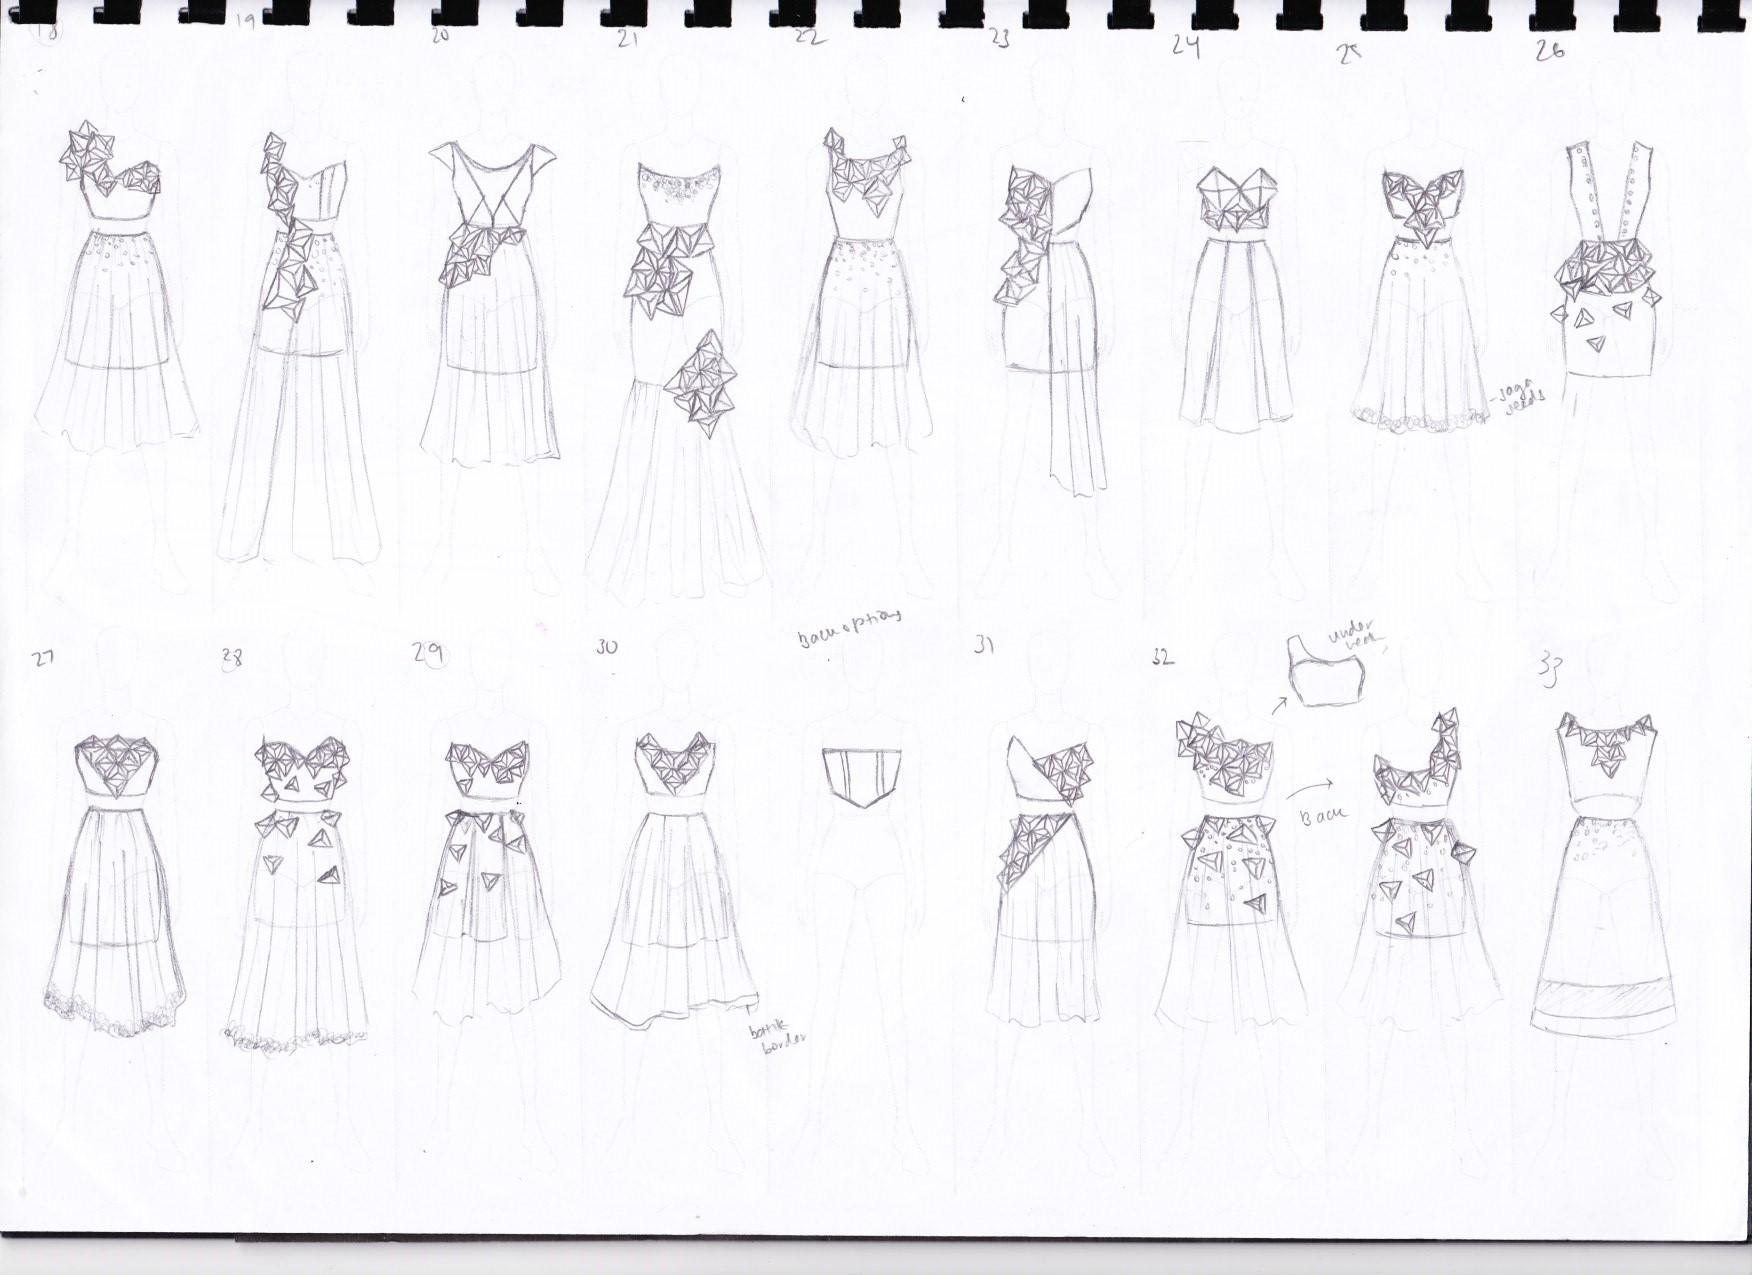 Developmental Sketches